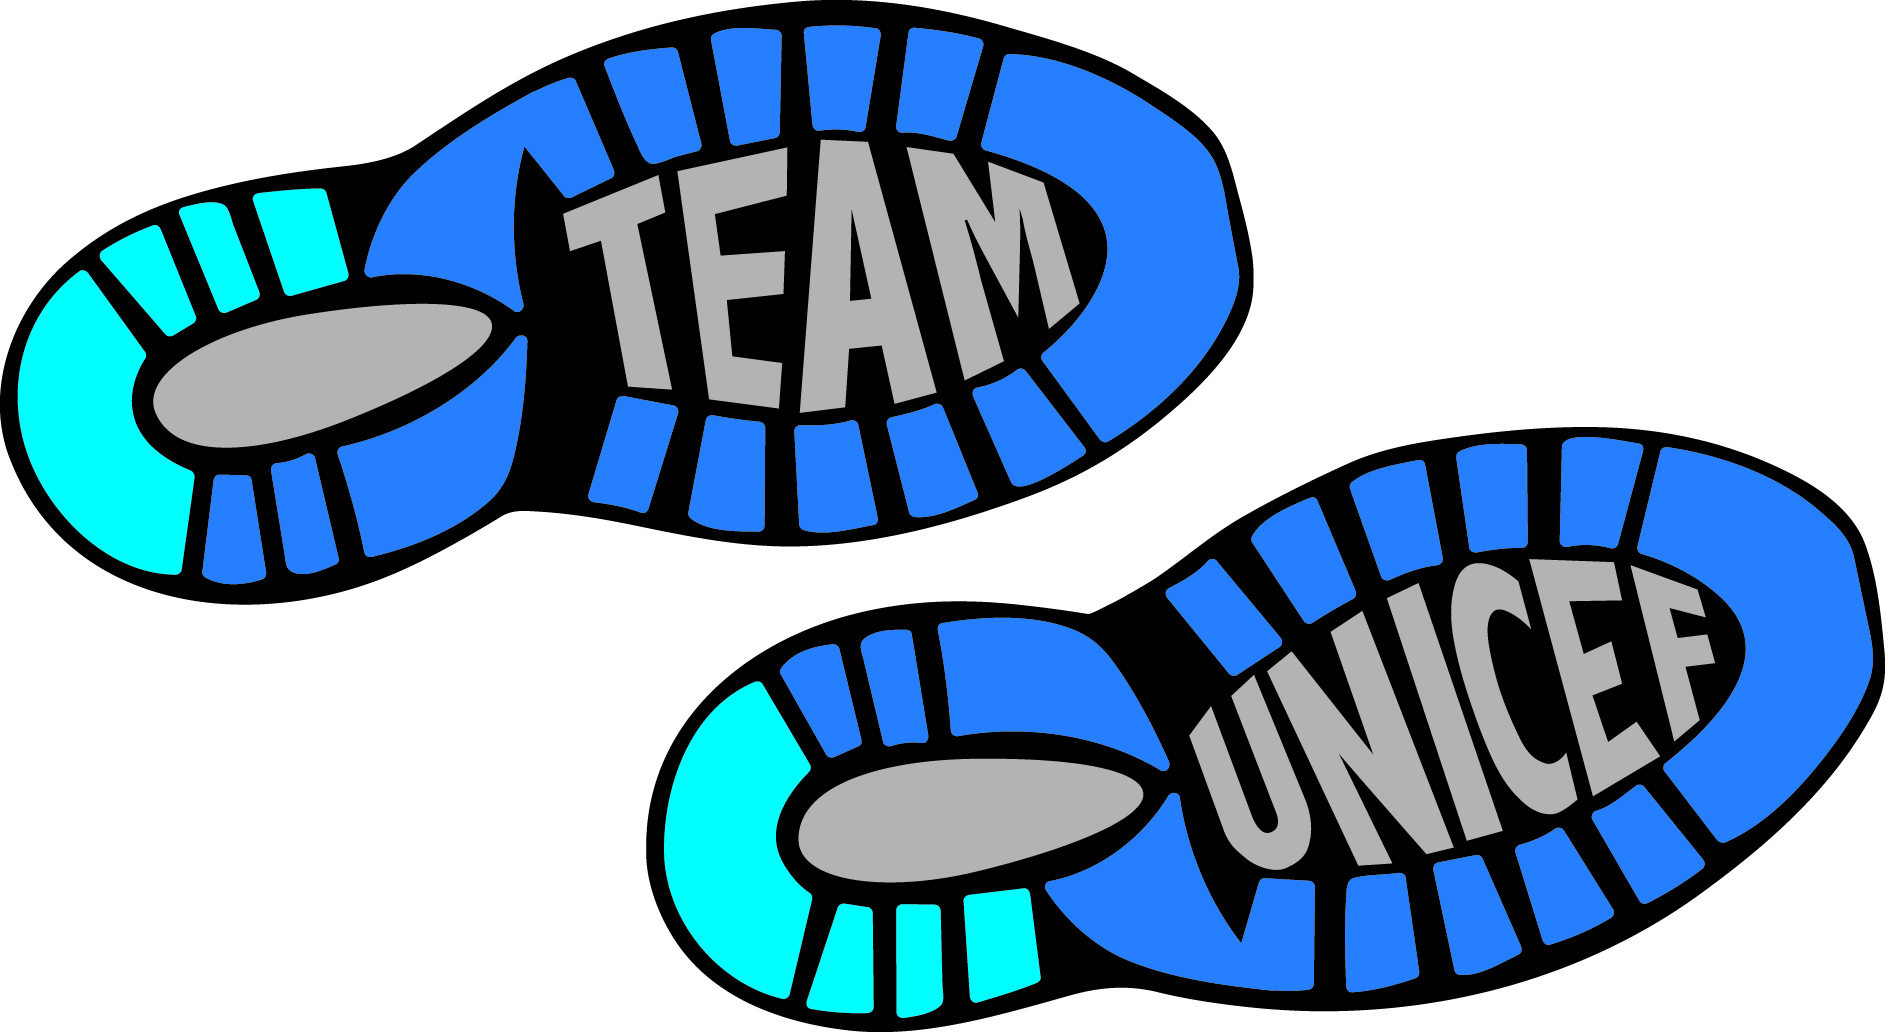 Us fund for unicef clipart clip stock Team UNICEF 2017 NYC Marathon | UNICEF USA clip stock